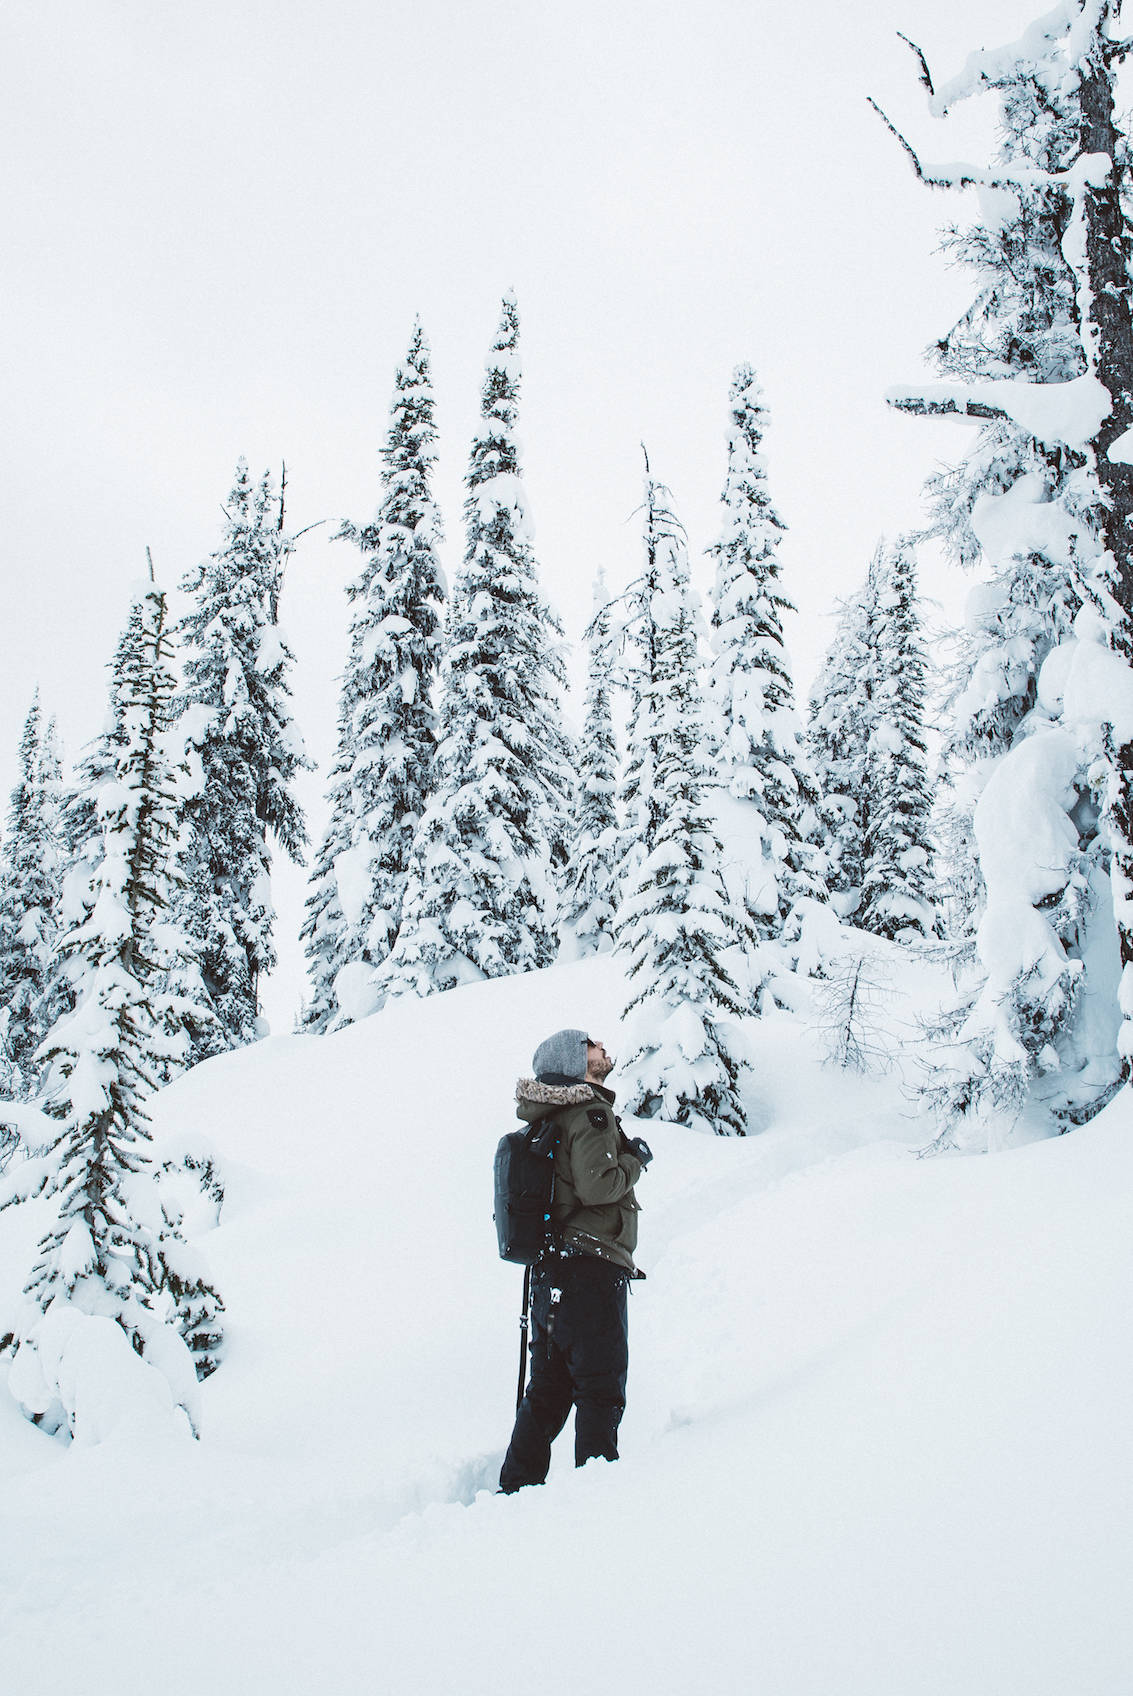 Alberta this winter